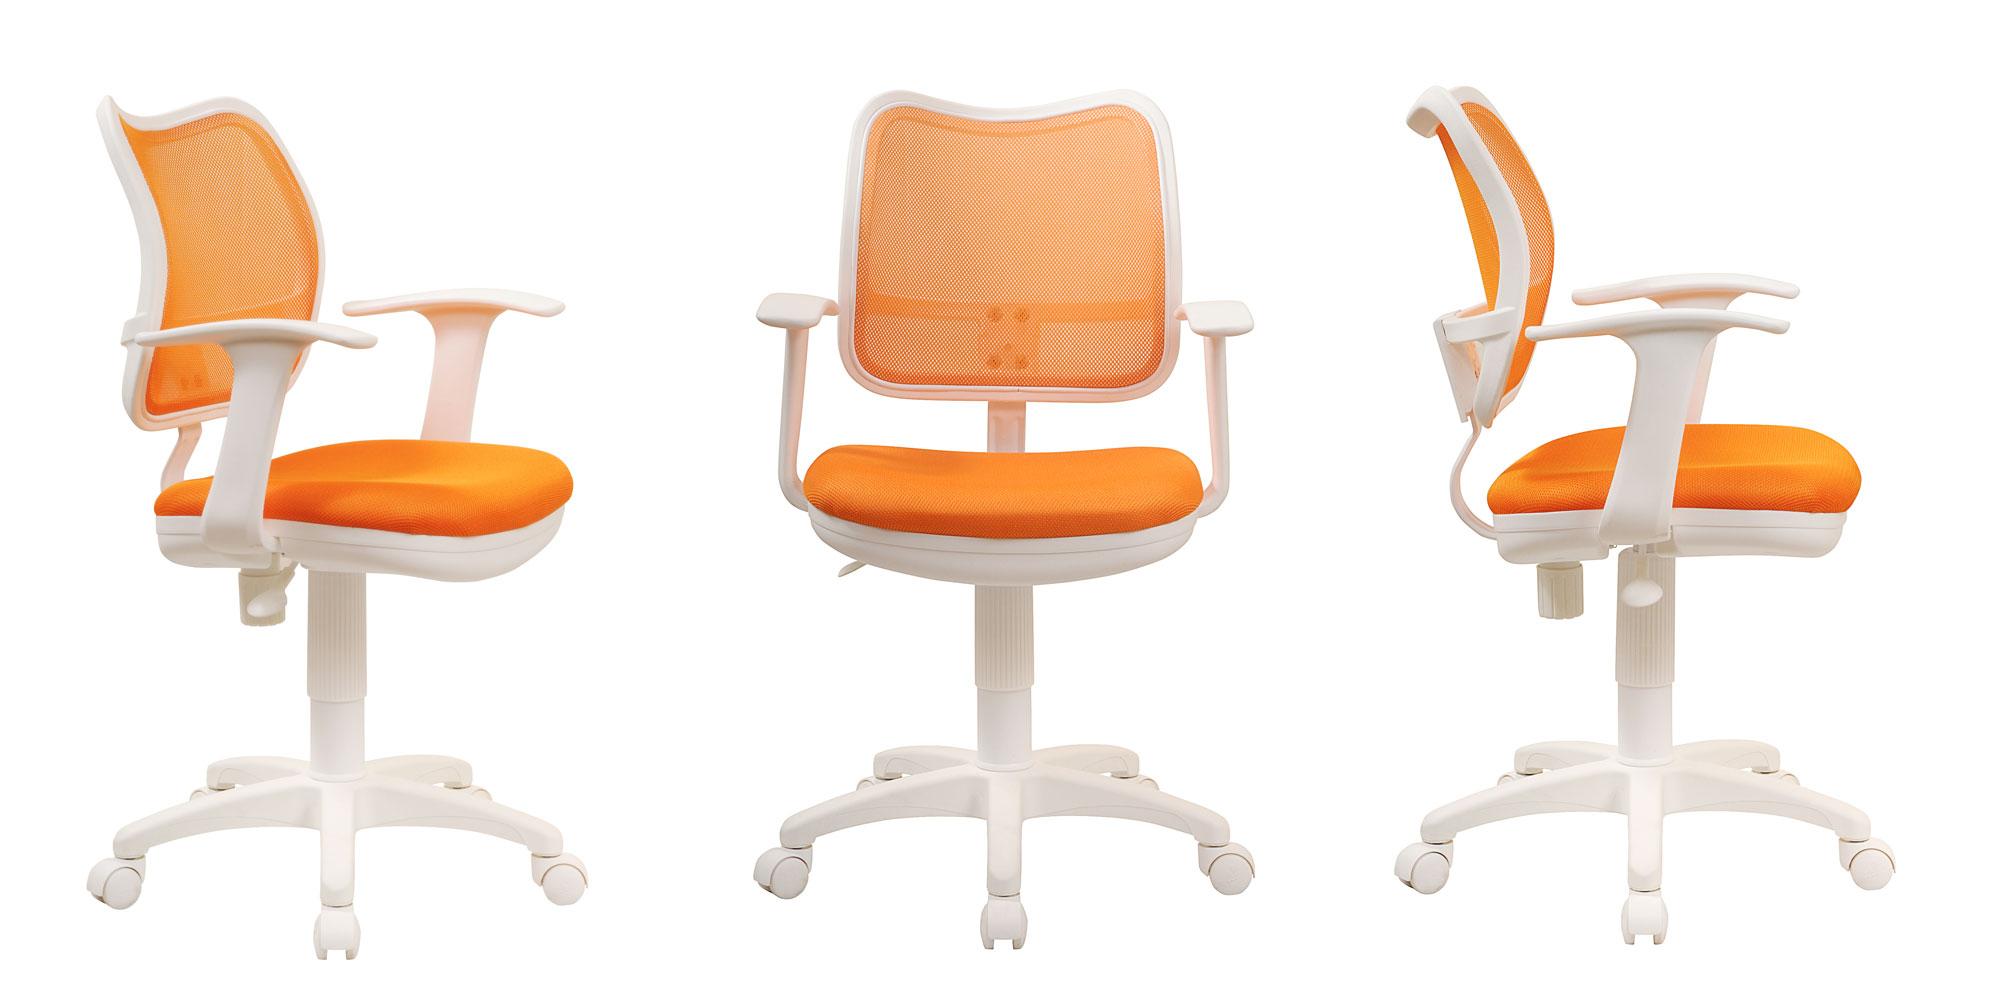 Кресло офисное на колесиках характеристики